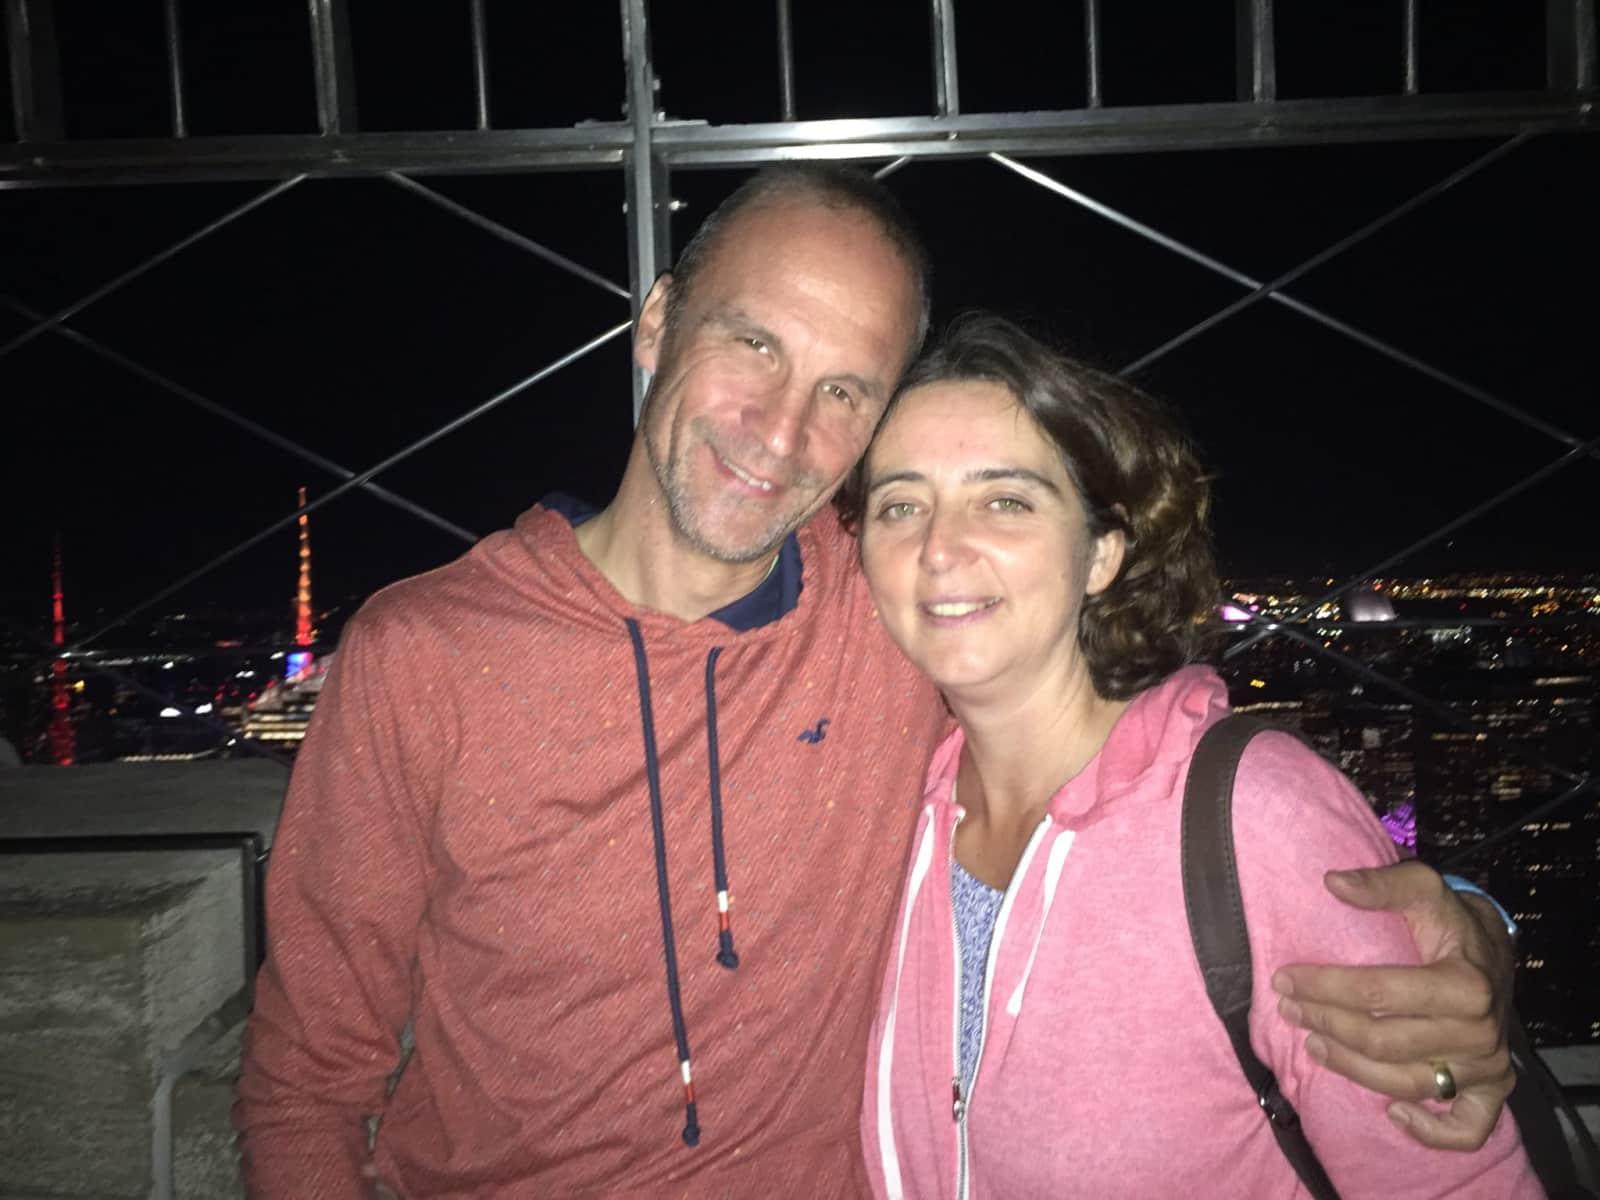 Christine & Torsten from Lüneburg, Germany